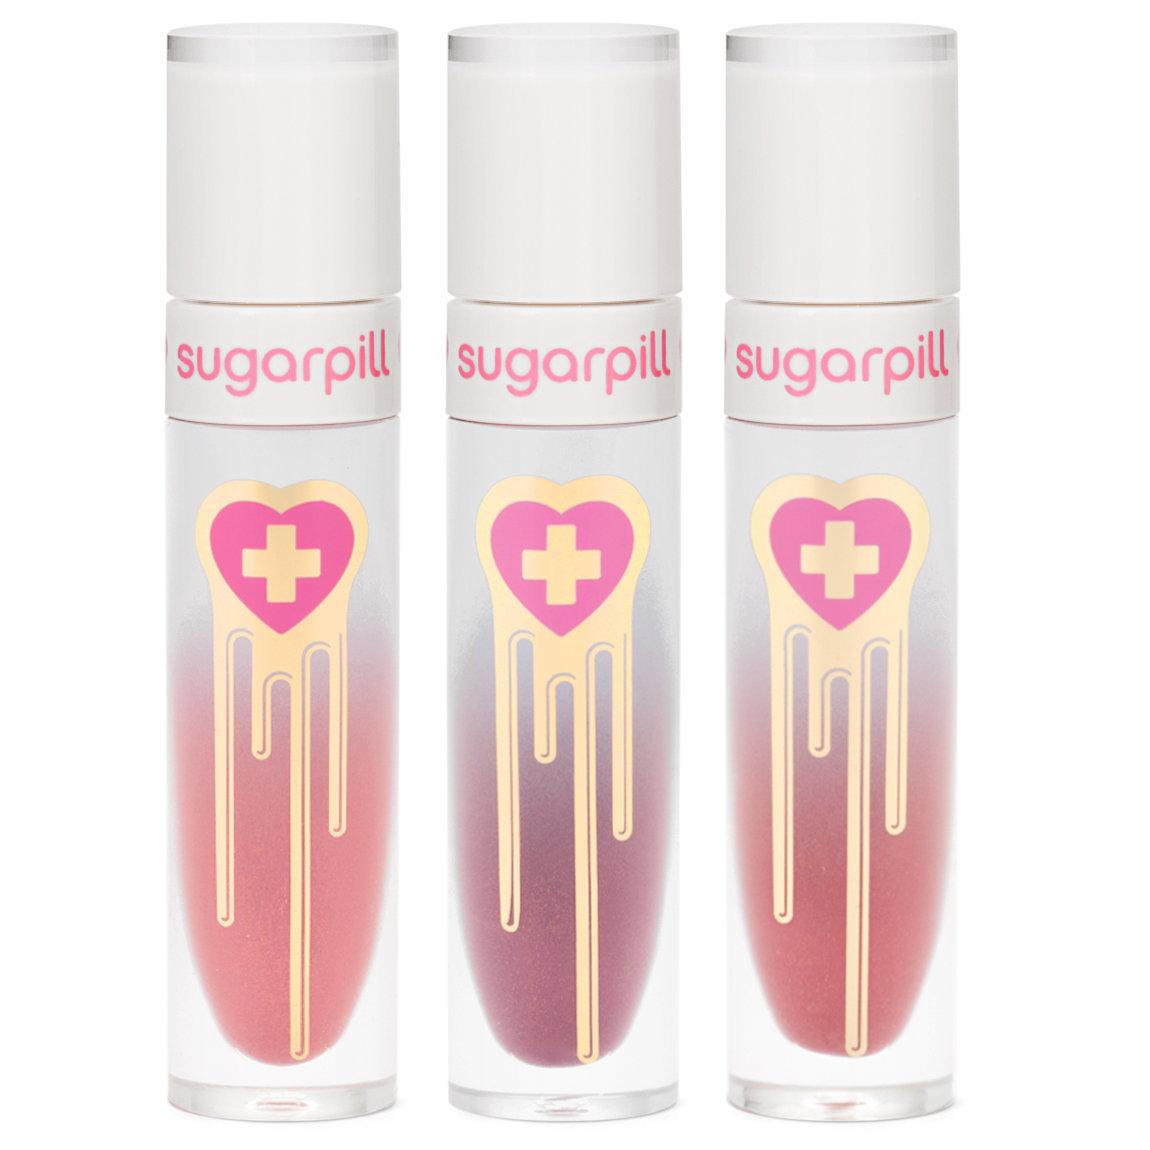 Sugarpill Cosmetics Trinket Trio product swatch.